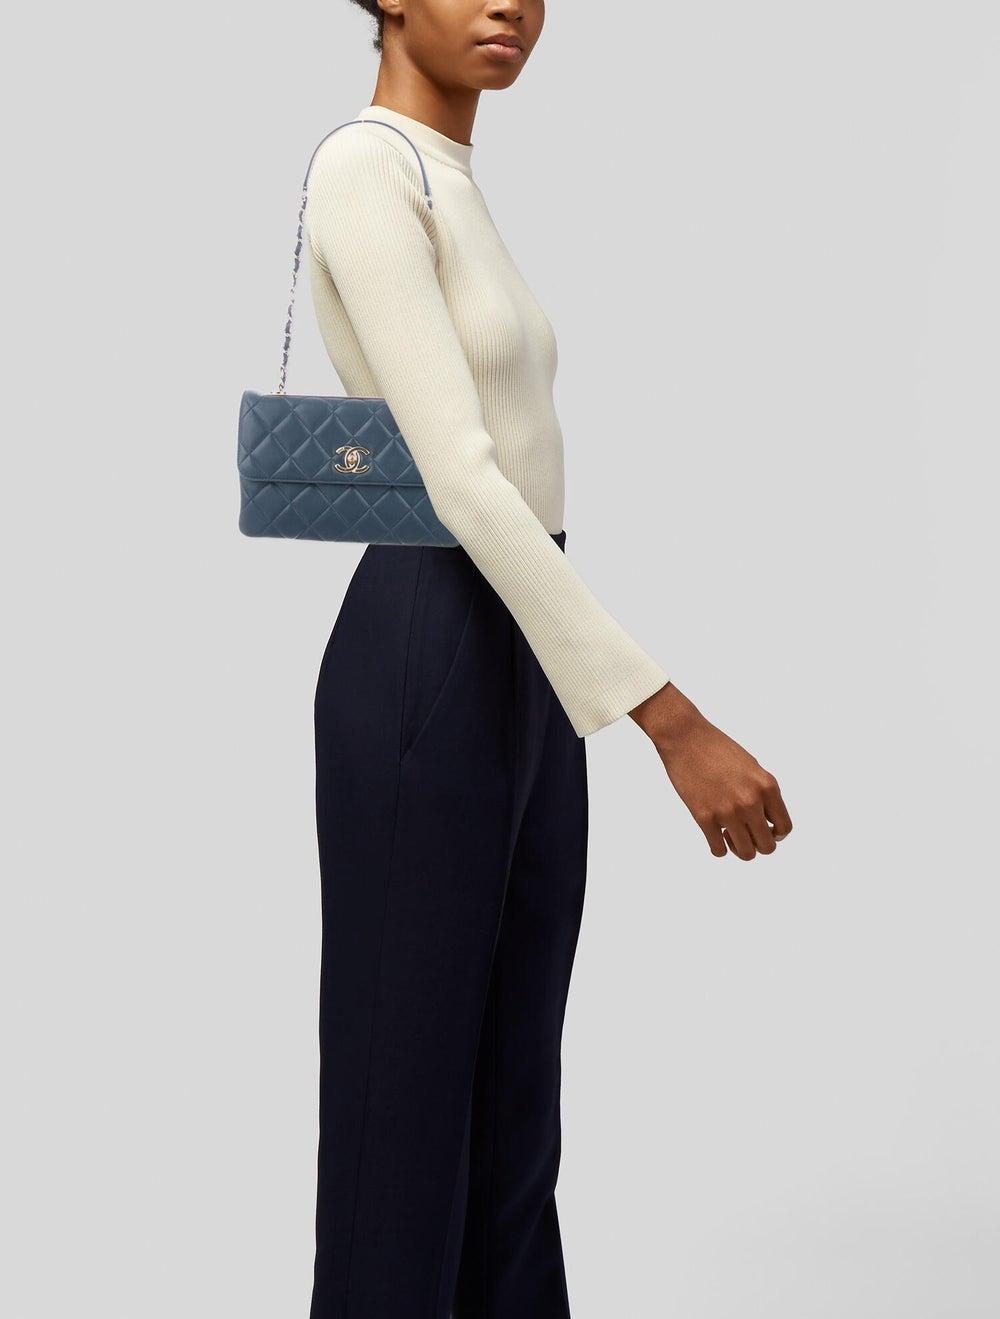 Chanel Trendy CC Flap Bag Blue - image 2